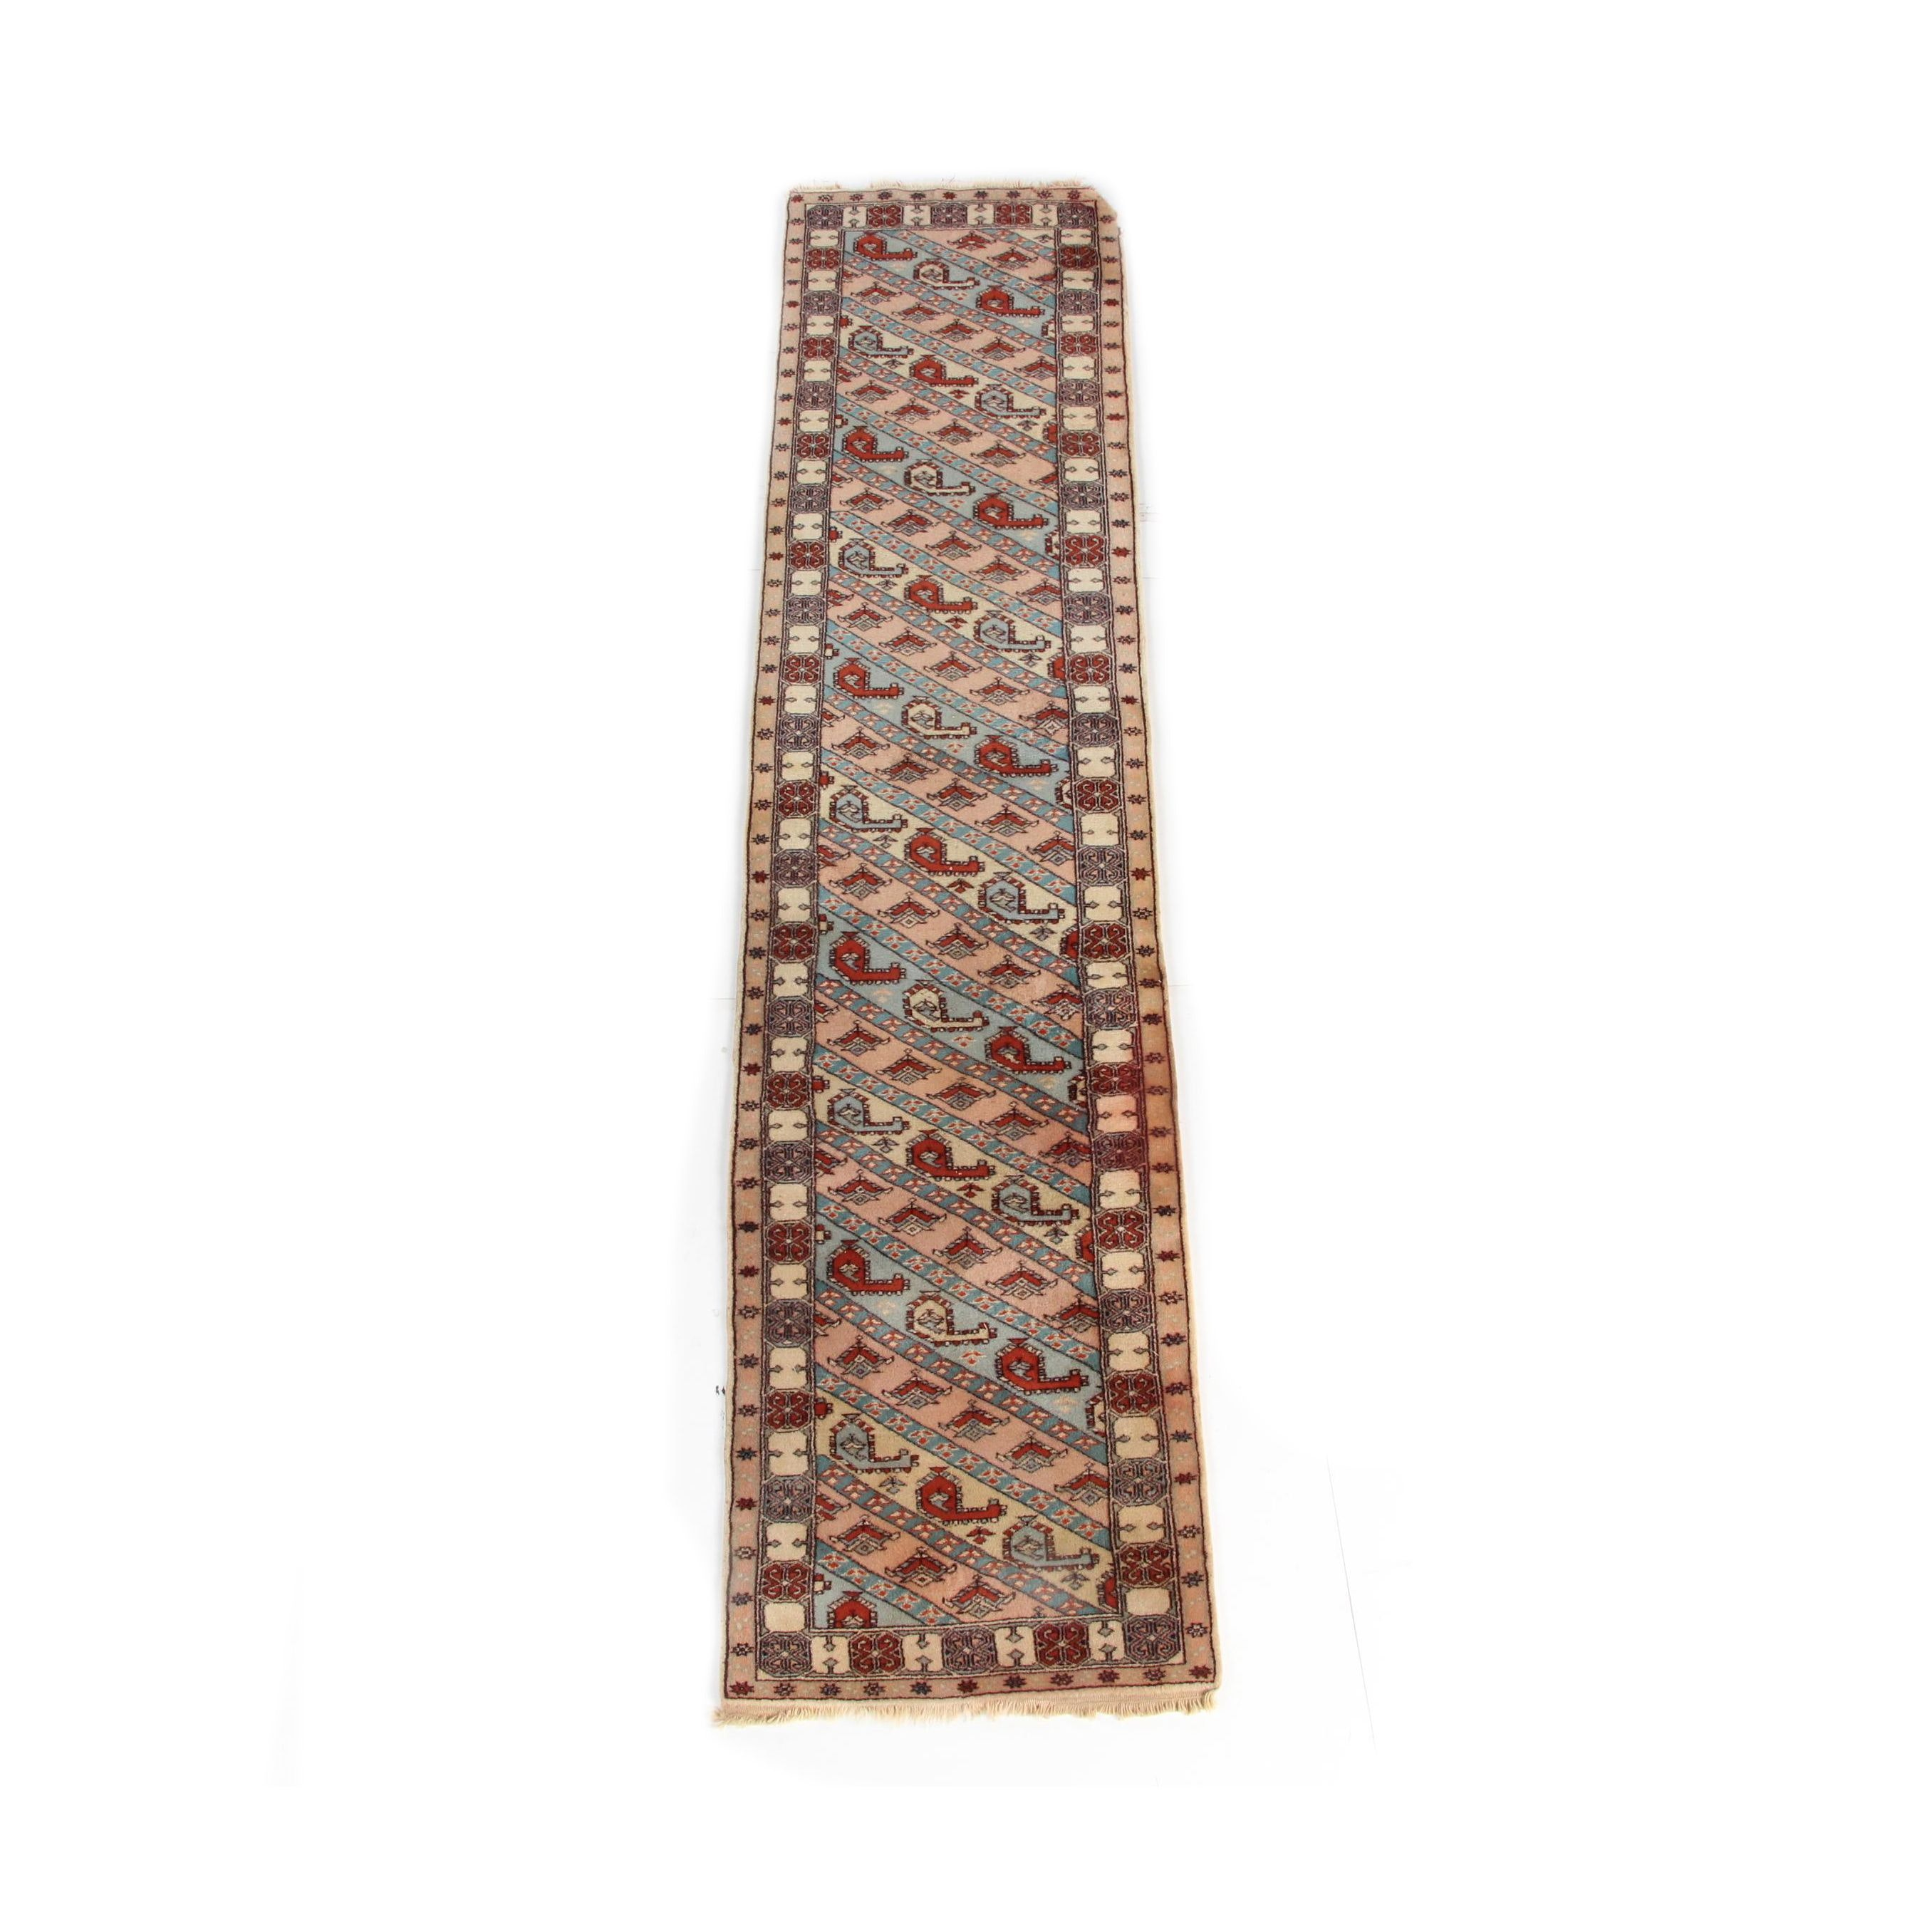 Vintage Hand-Knotted Caucasian Genje Wool Carpet Runner